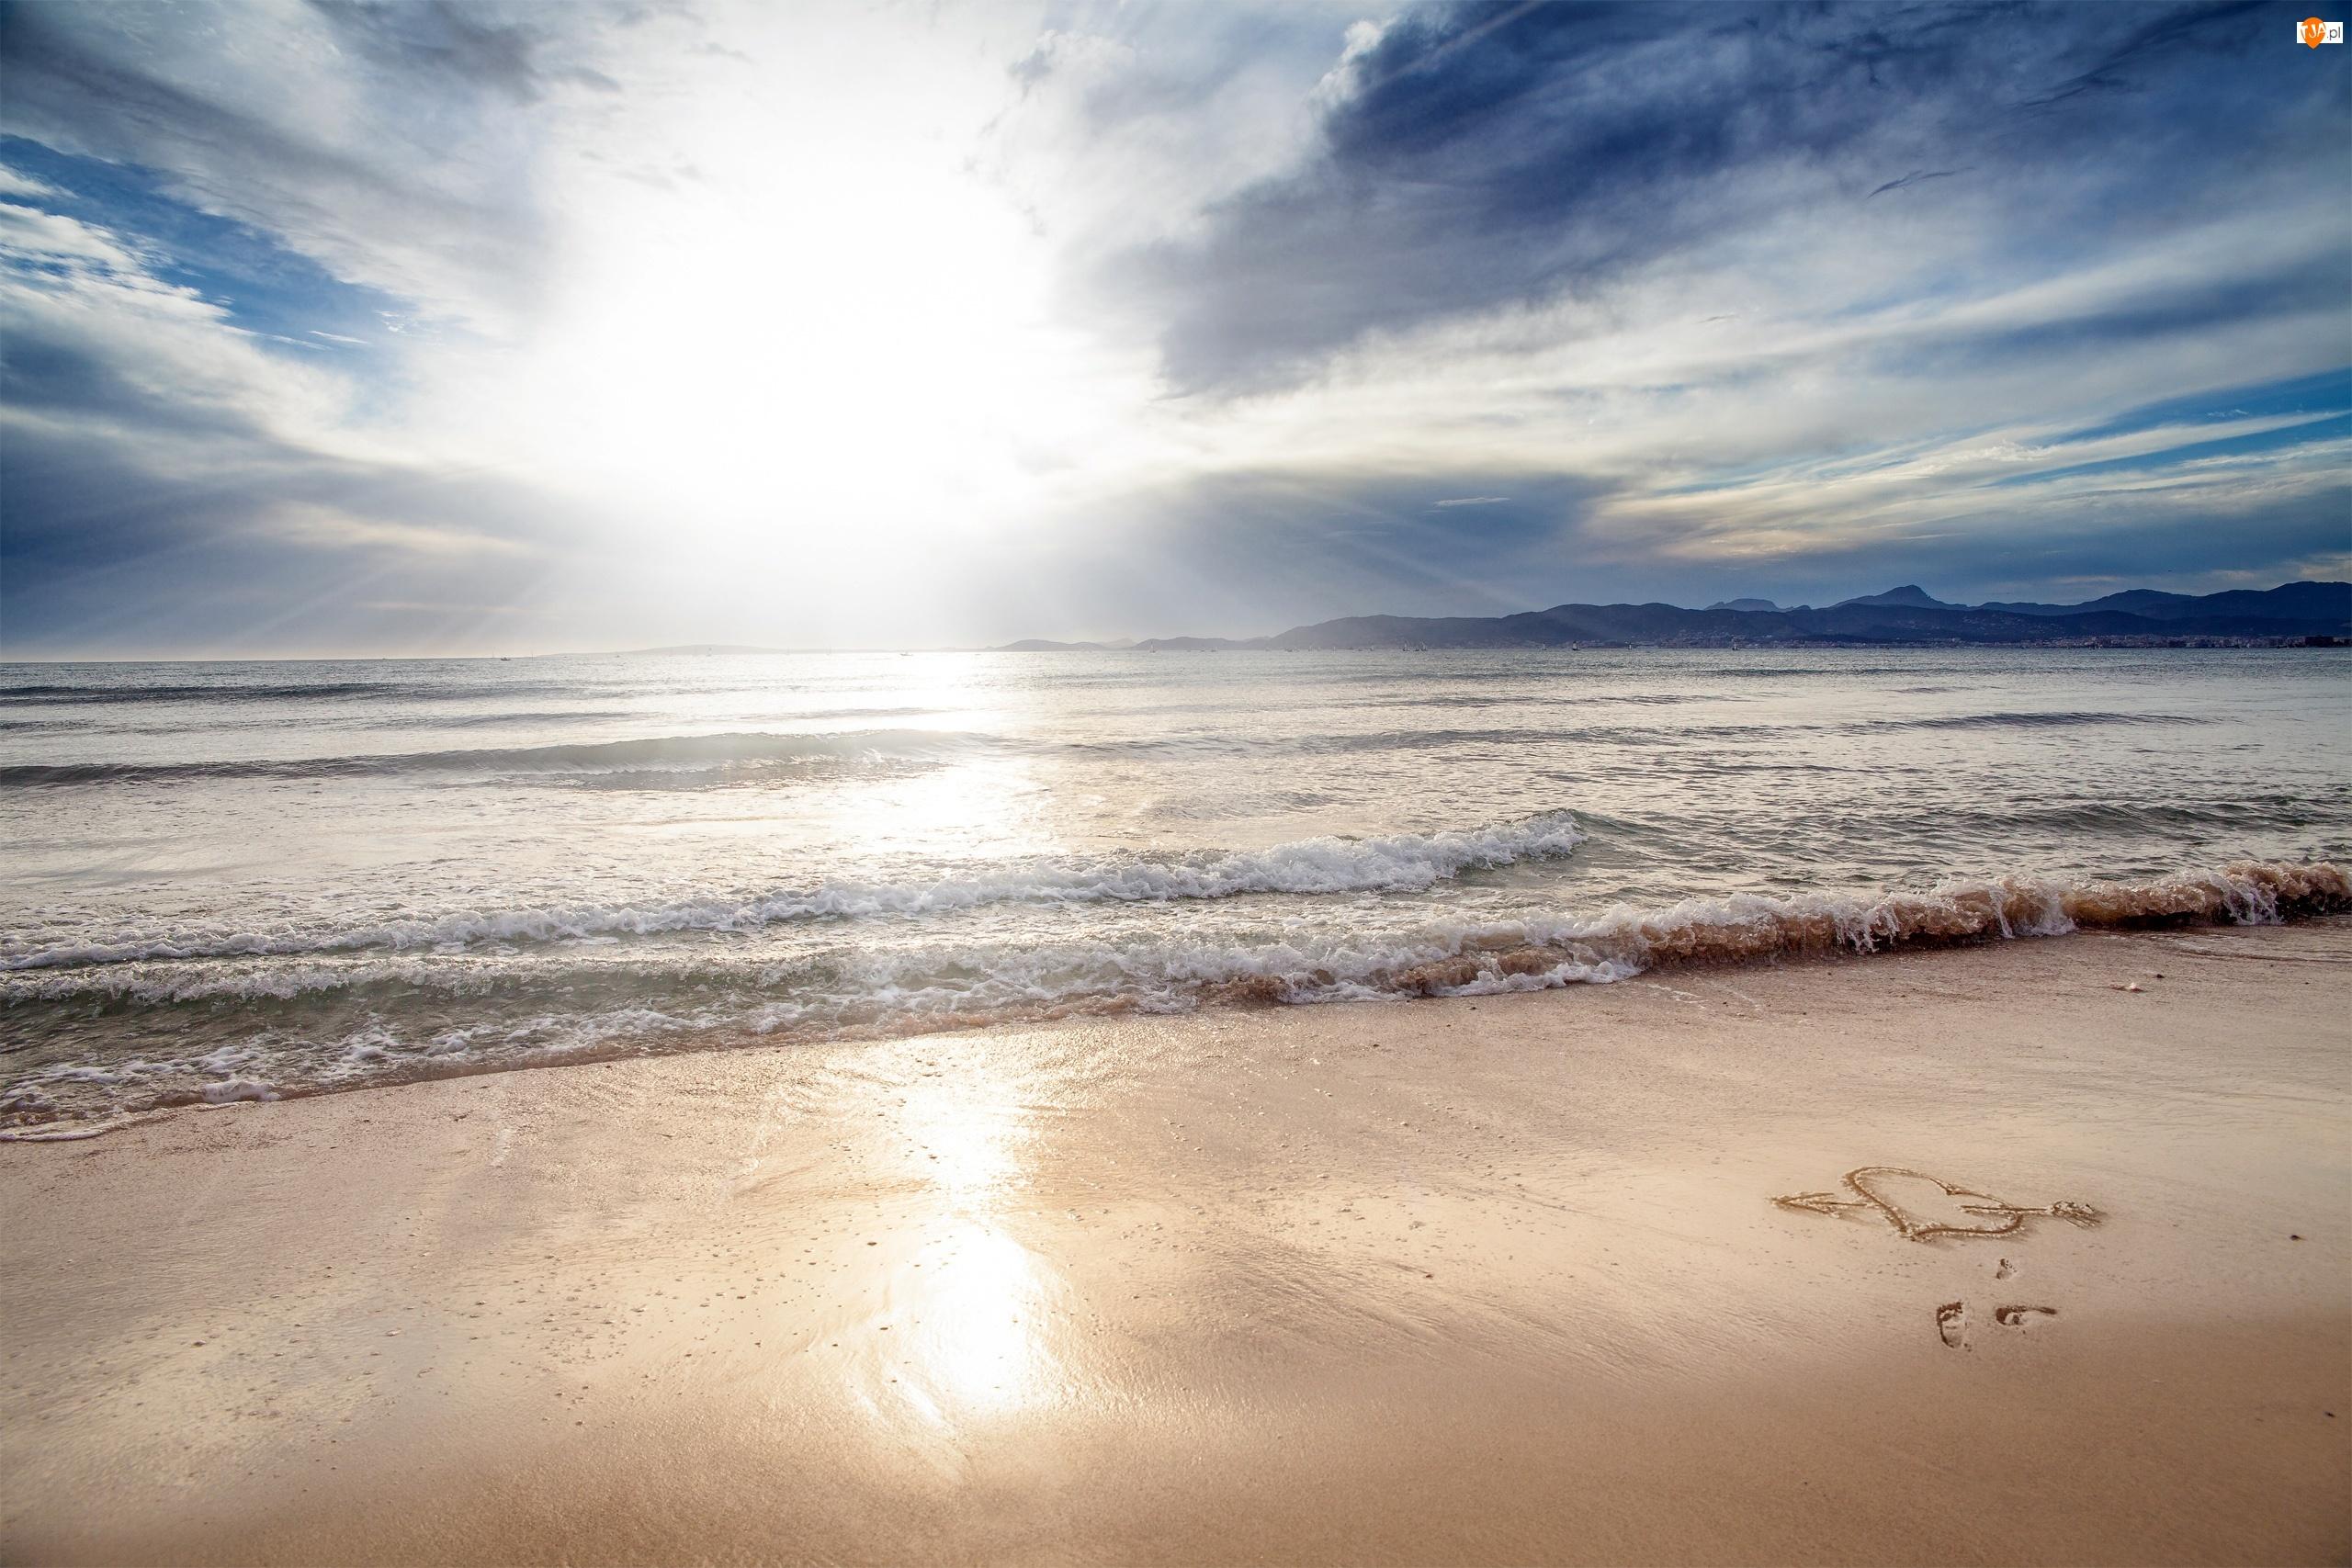 Plaża, Góry, Morze